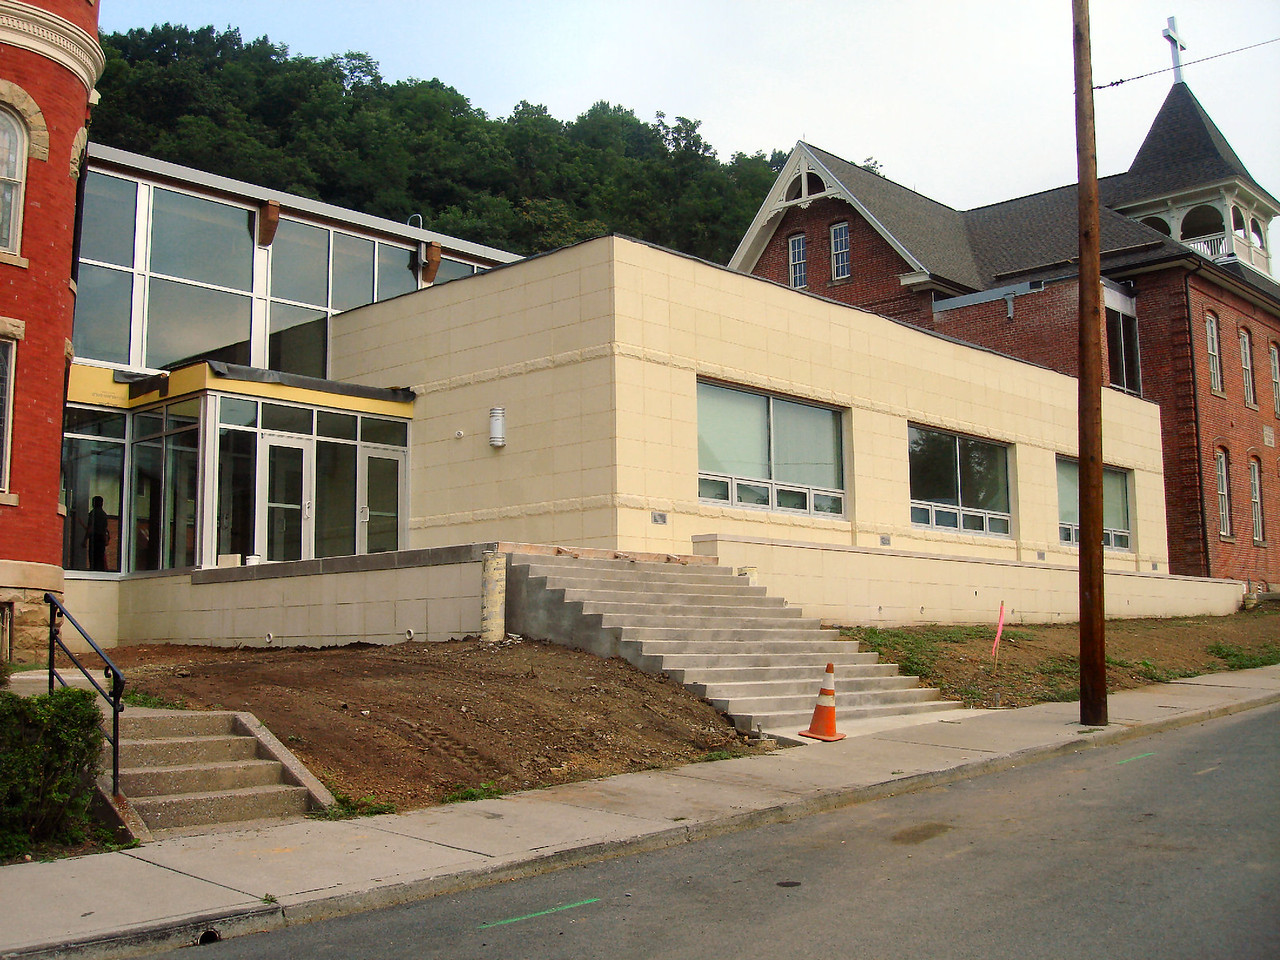 Saint Matthews Renovations 7-28-07 (7)